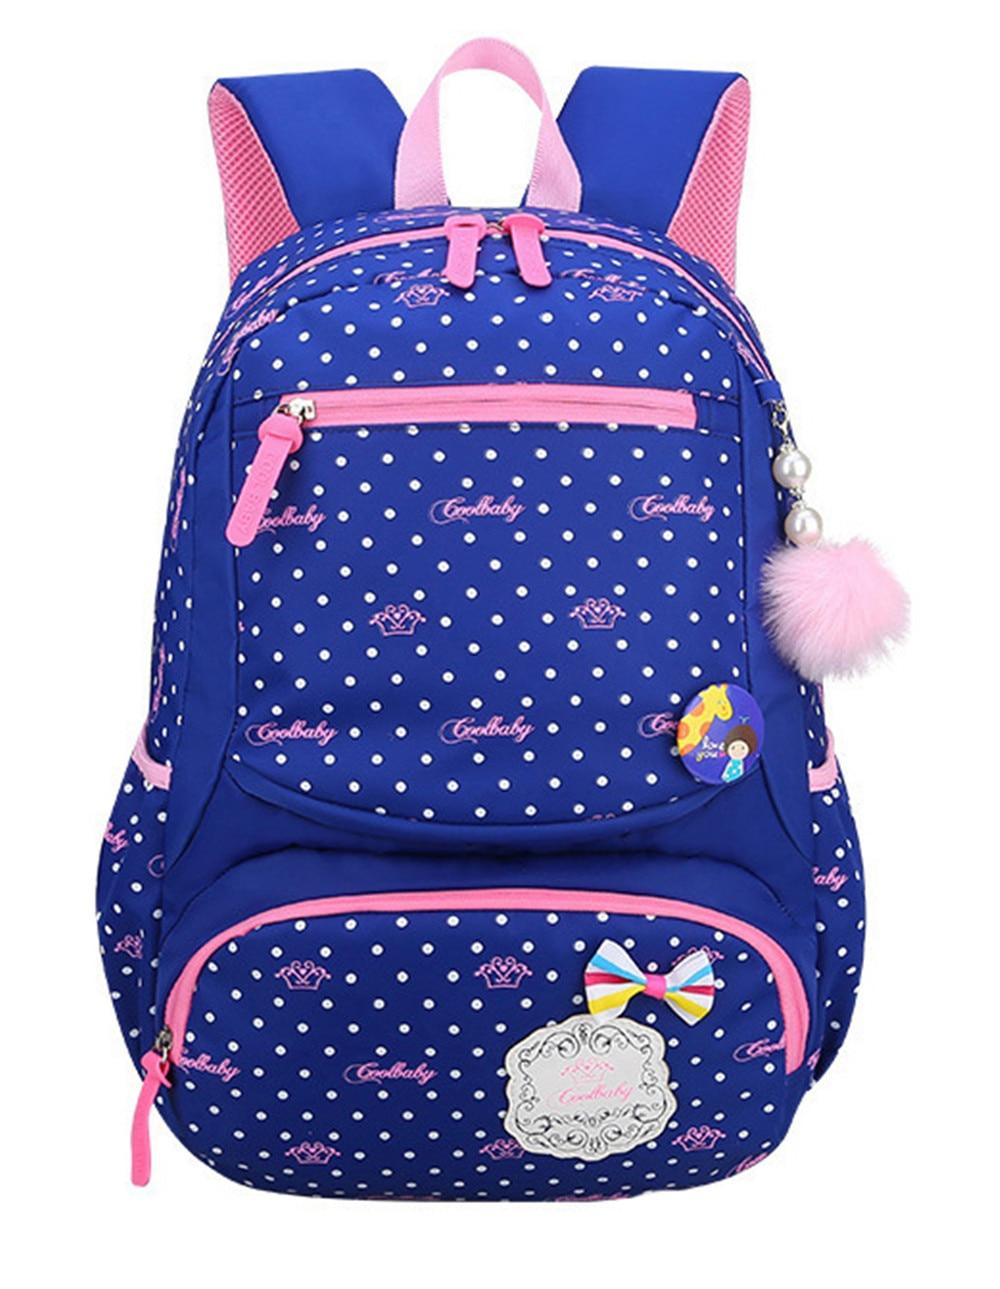 Cute Children School Bags For Girls Waterproof printing Backpack Kids book bag Satchel Child Schoolbag rucksack mochila